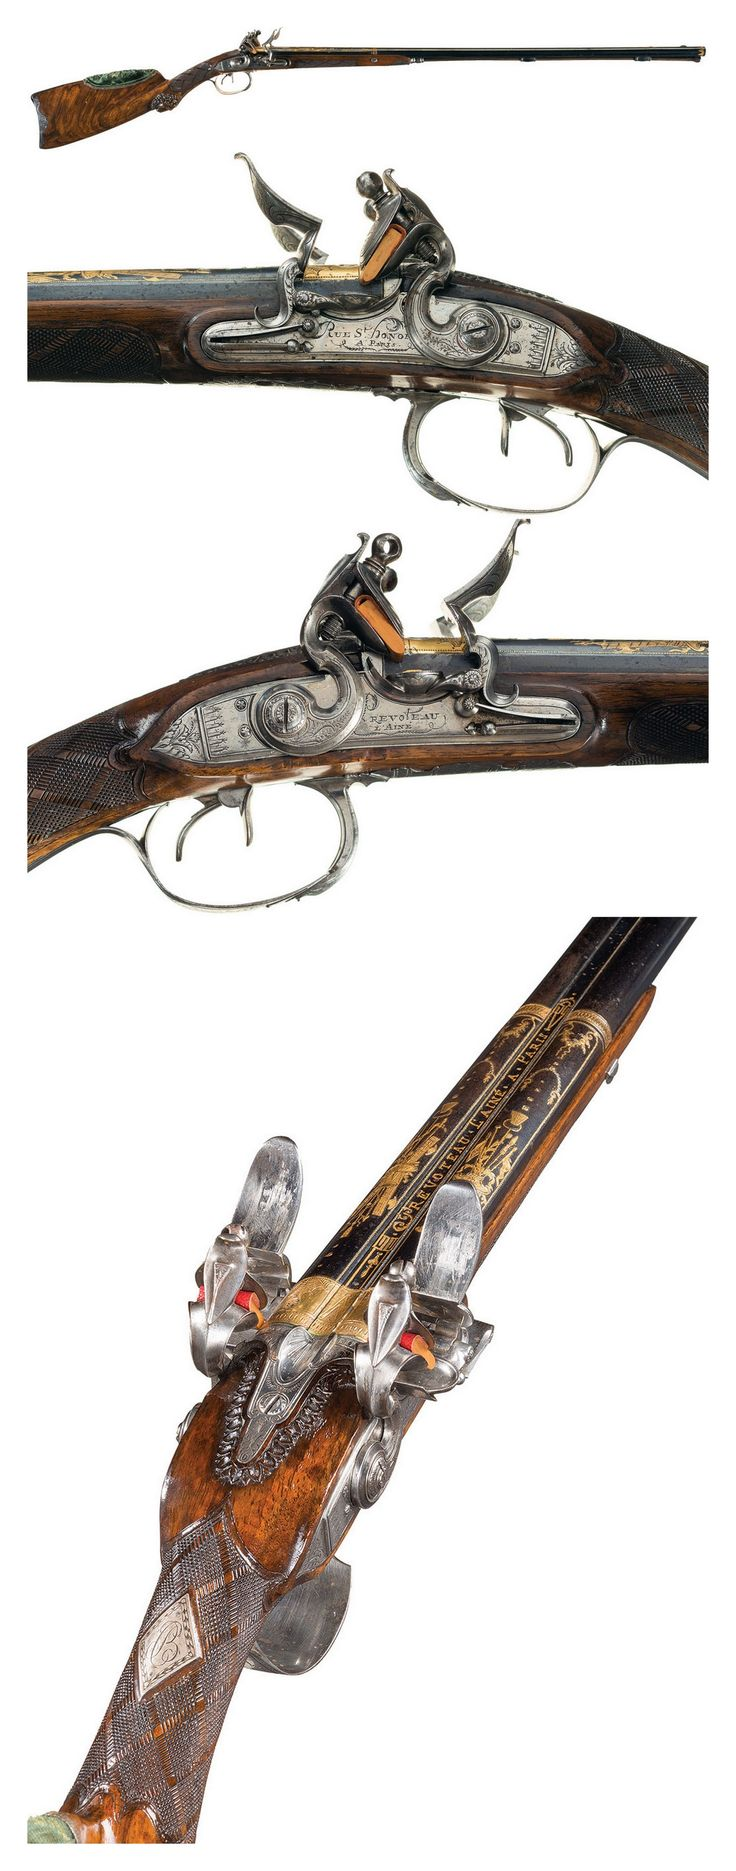 A gold inlaid French double barrel flintlock shotgun produced by Revoteau L'aine A Paris, circa 1800.